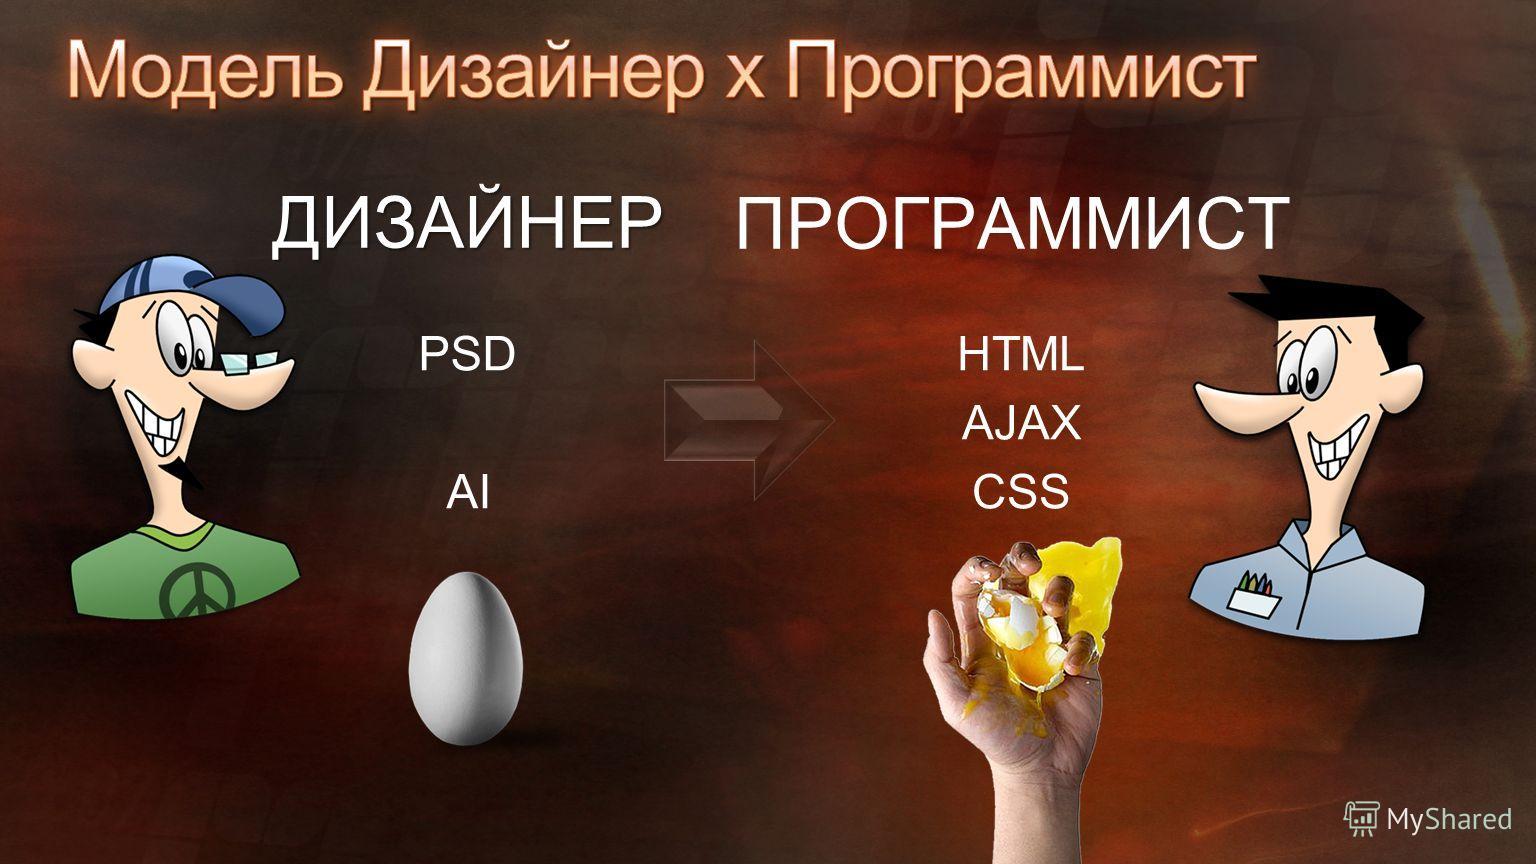 ДИЗАЙНЕР ПРОГРАММИСТ PSD AI HTML AJAX CSS